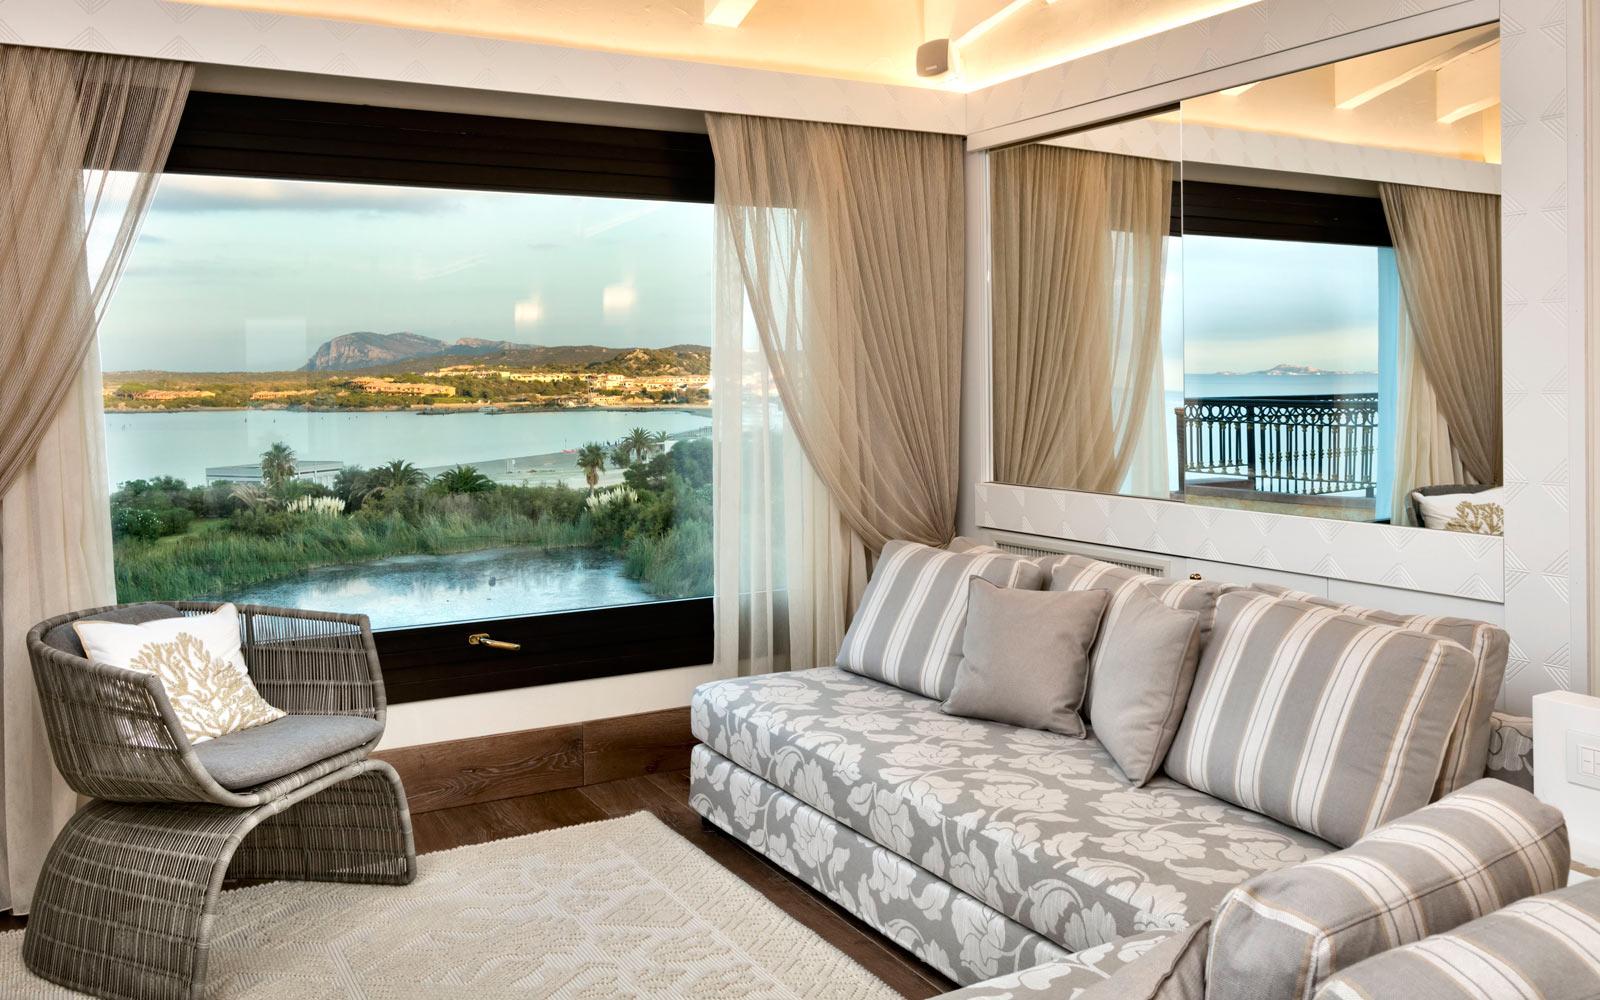 Suite Grazia Deledda at Hotel Abi D'Oru